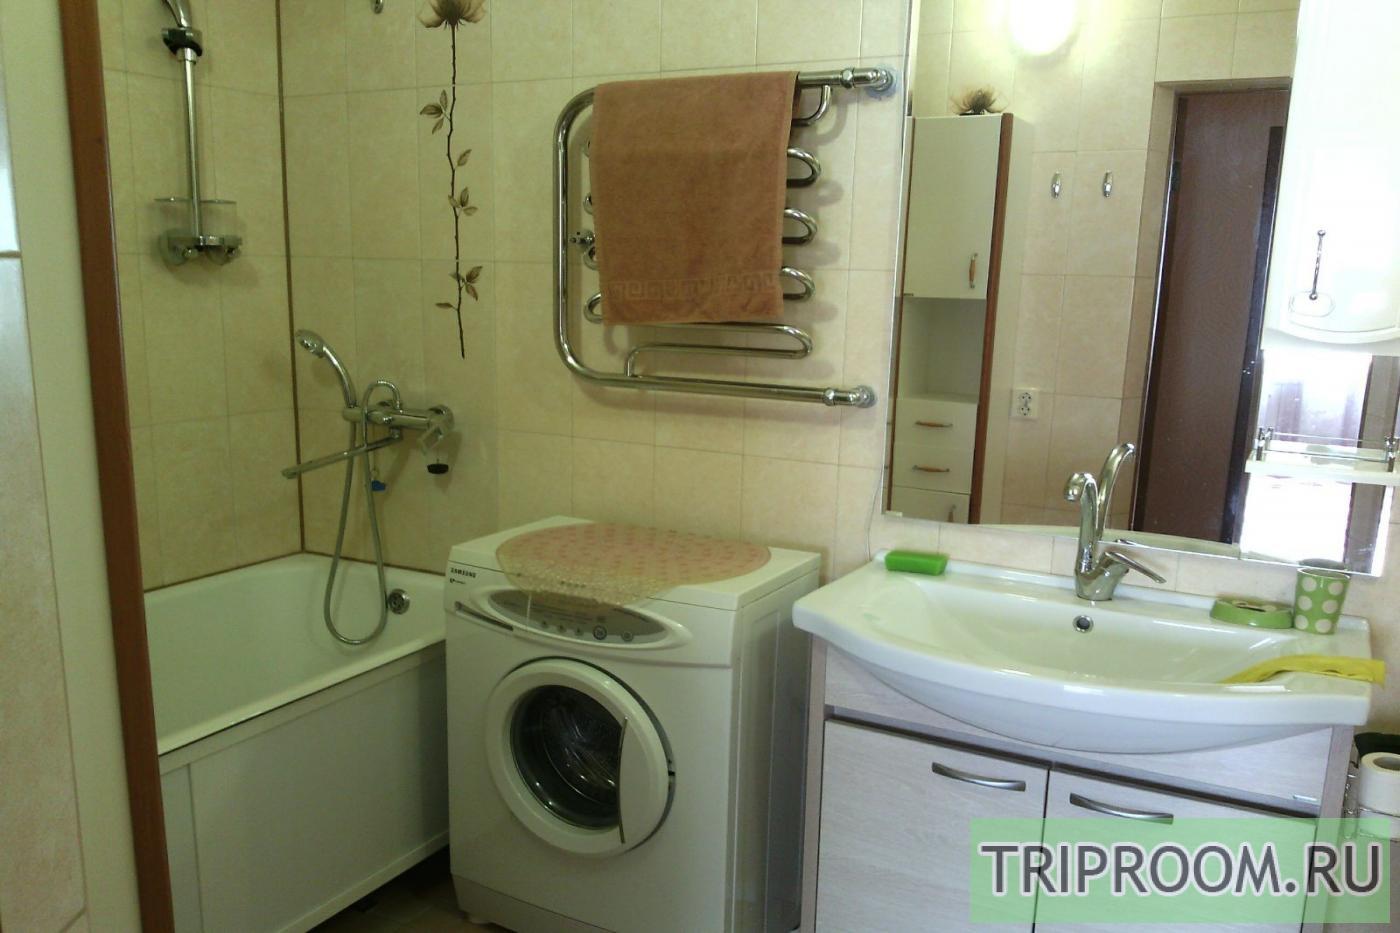 2-комнатная квартира посуточно (вариант № 33661), ул. Морозова Павла Леонтьевича, фото № 5